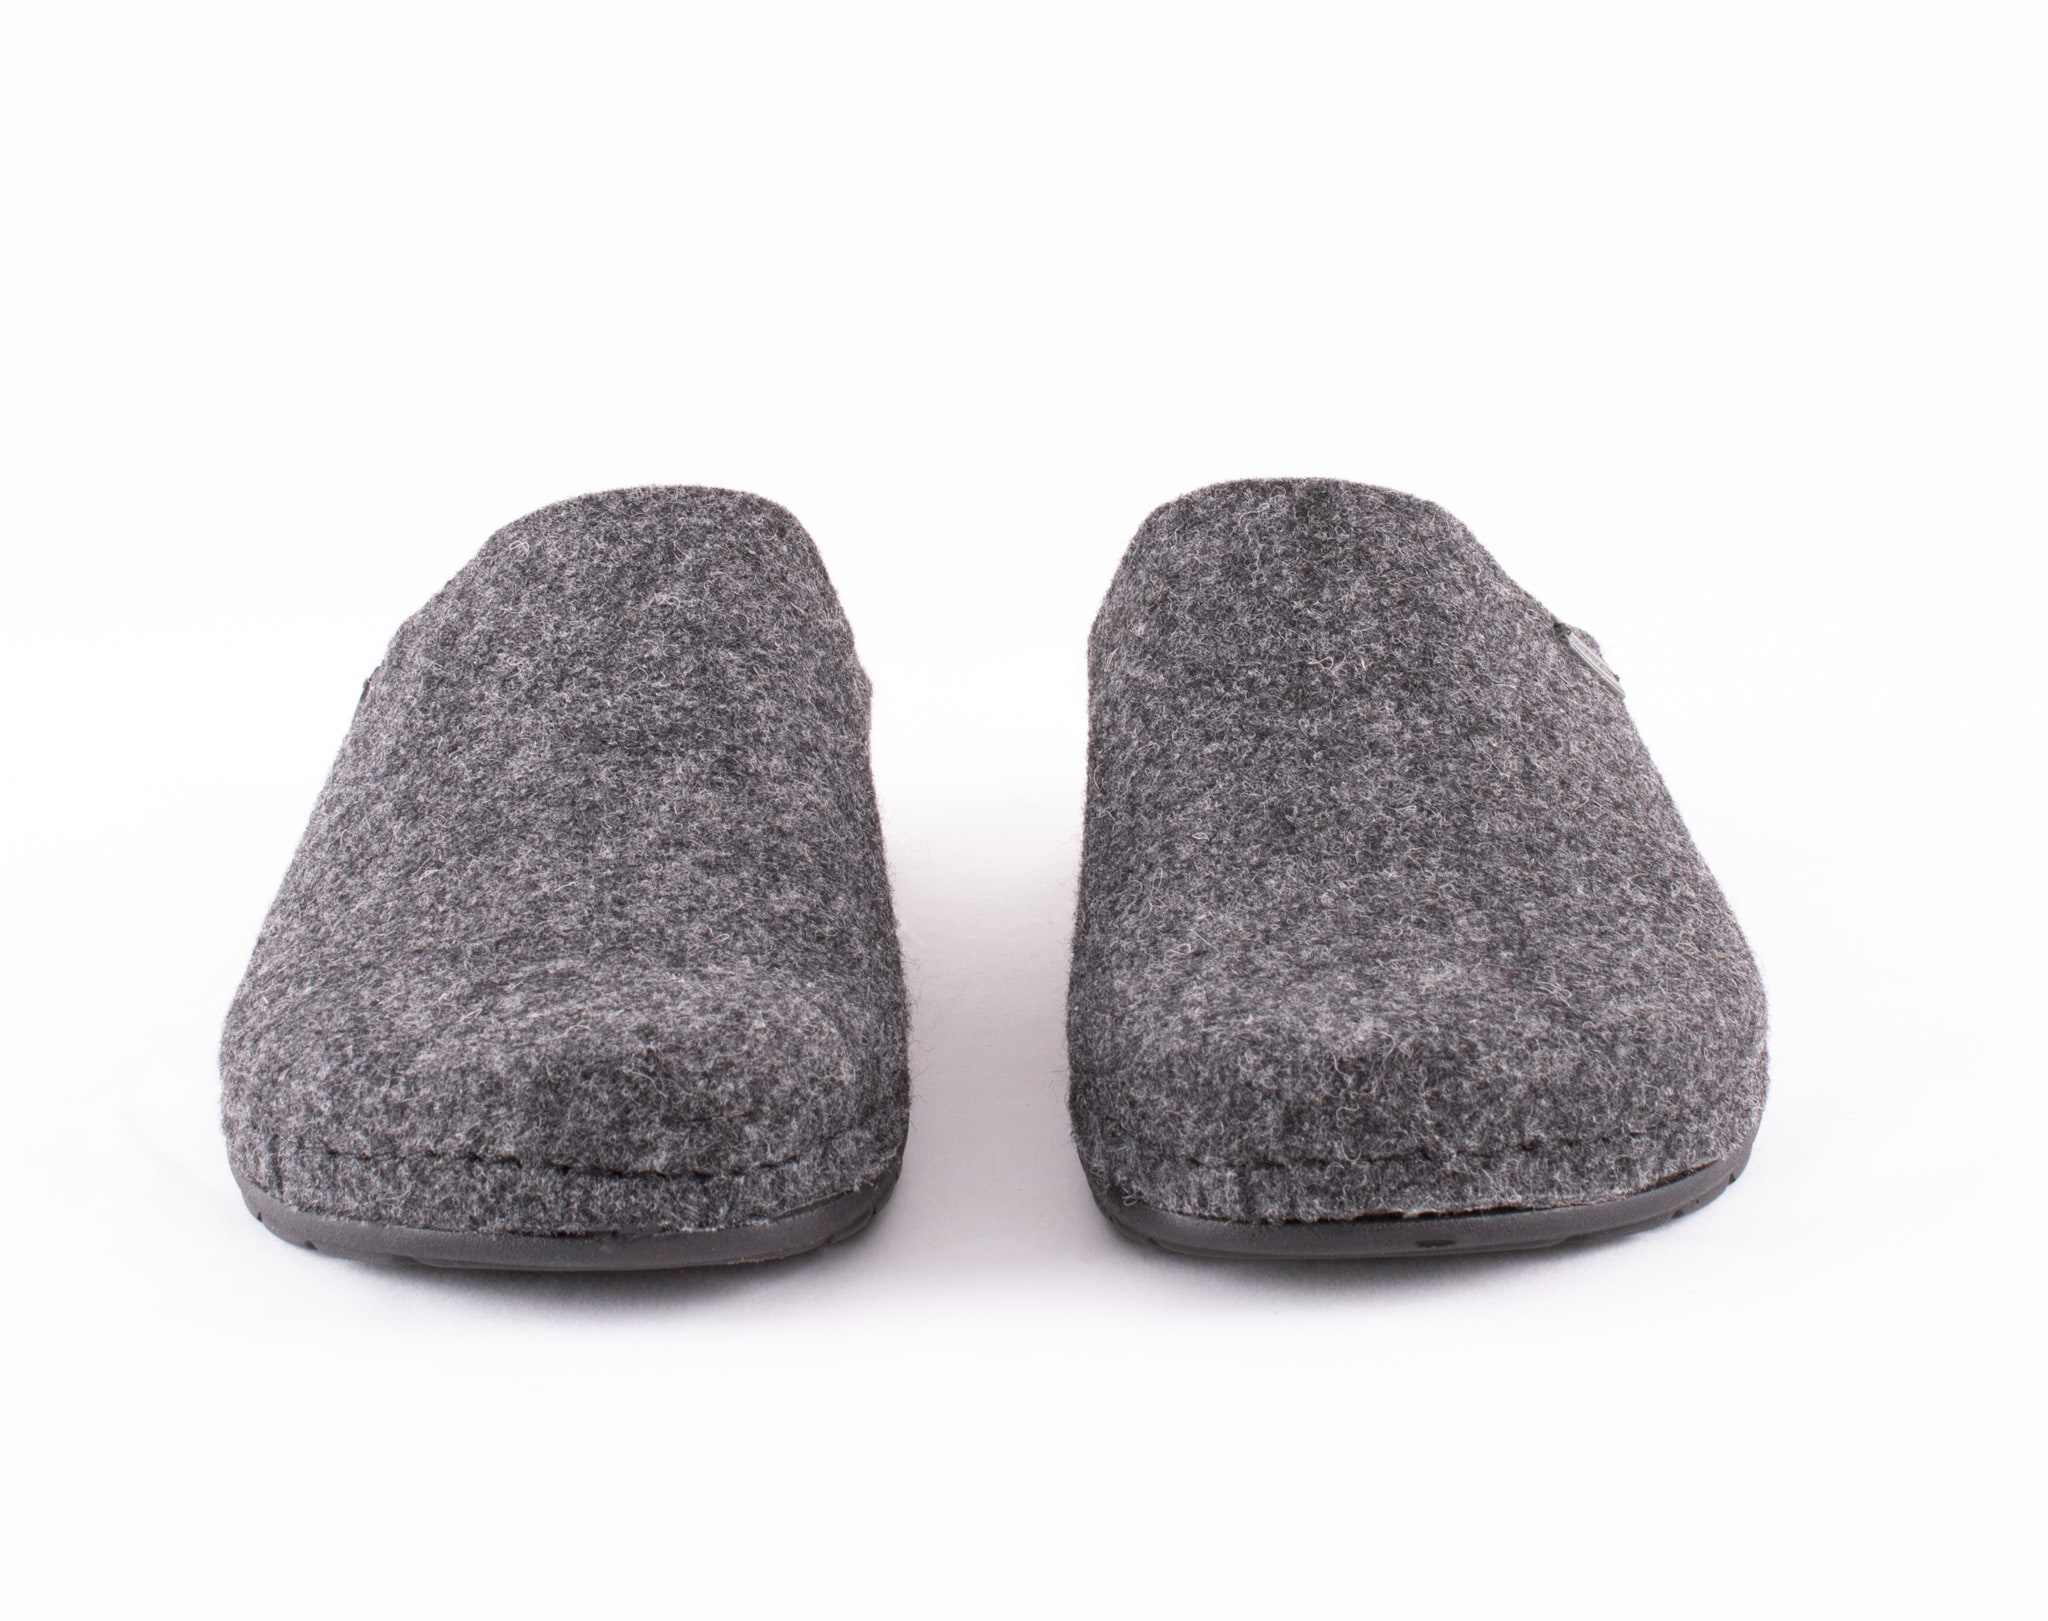 Samuel wool slippers